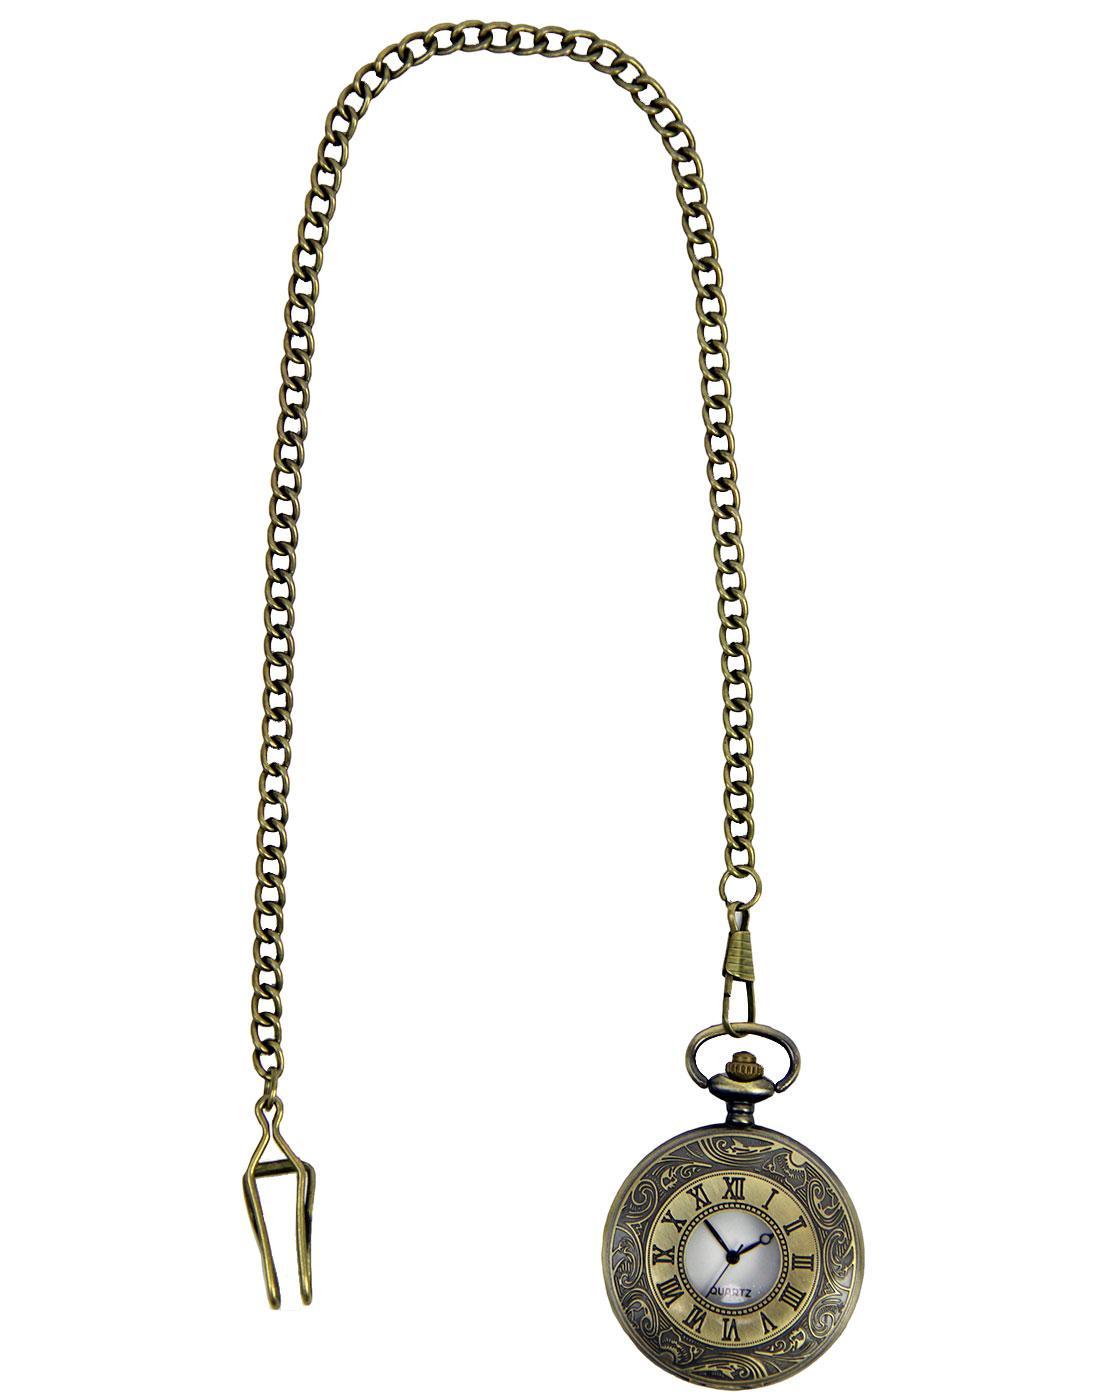 GIBSON LONDON Vintage Ornate Pocket Watch w/ Chain